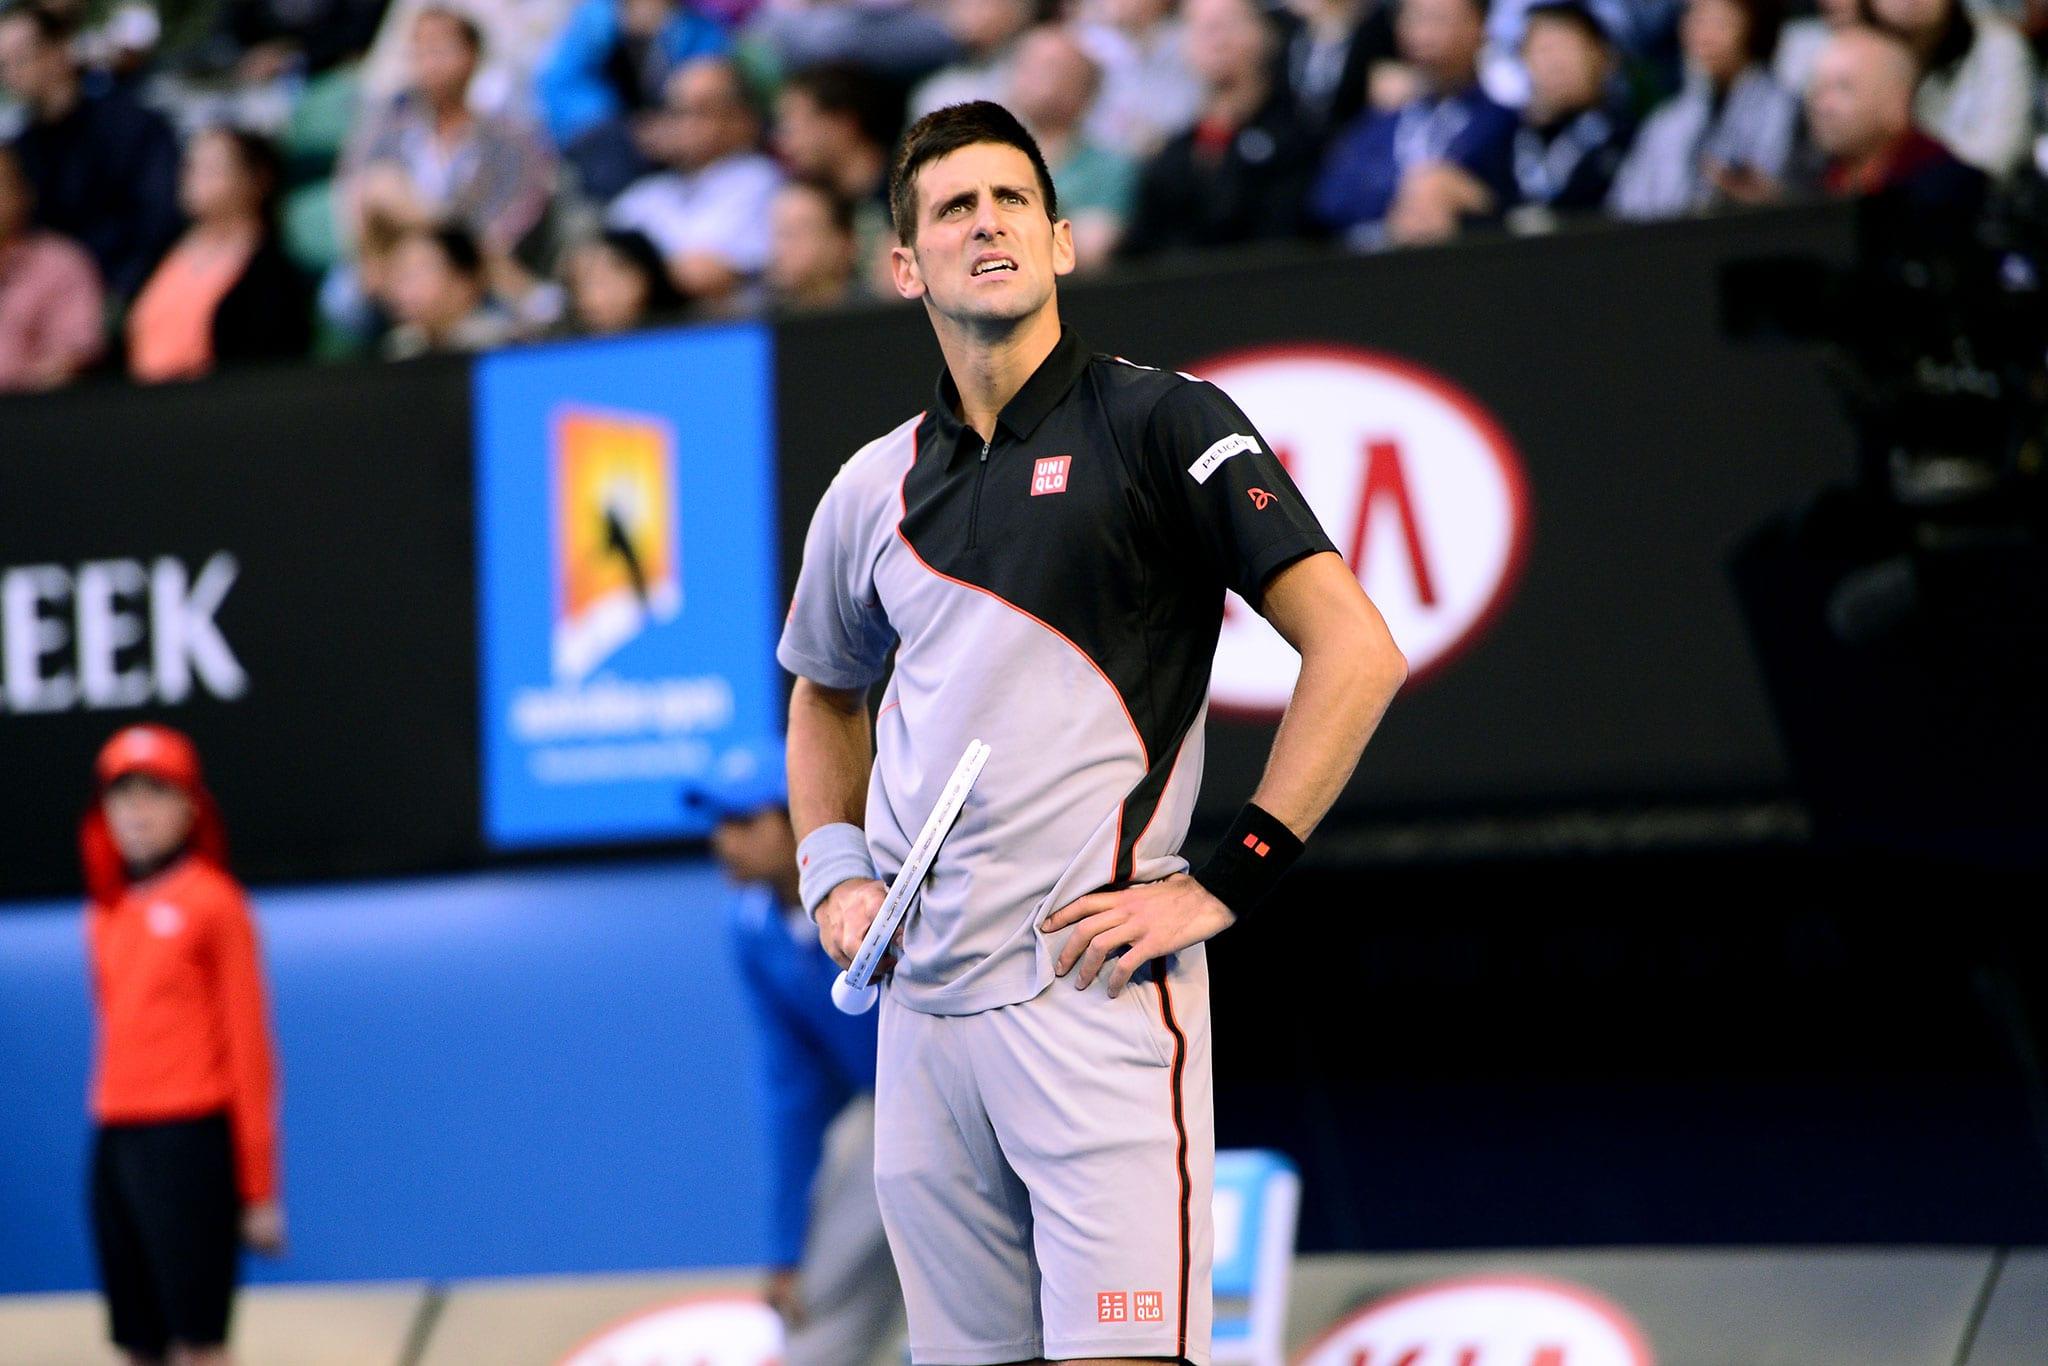 Tennis : Djokovic prend la porte, duel Federer-Murray en vue